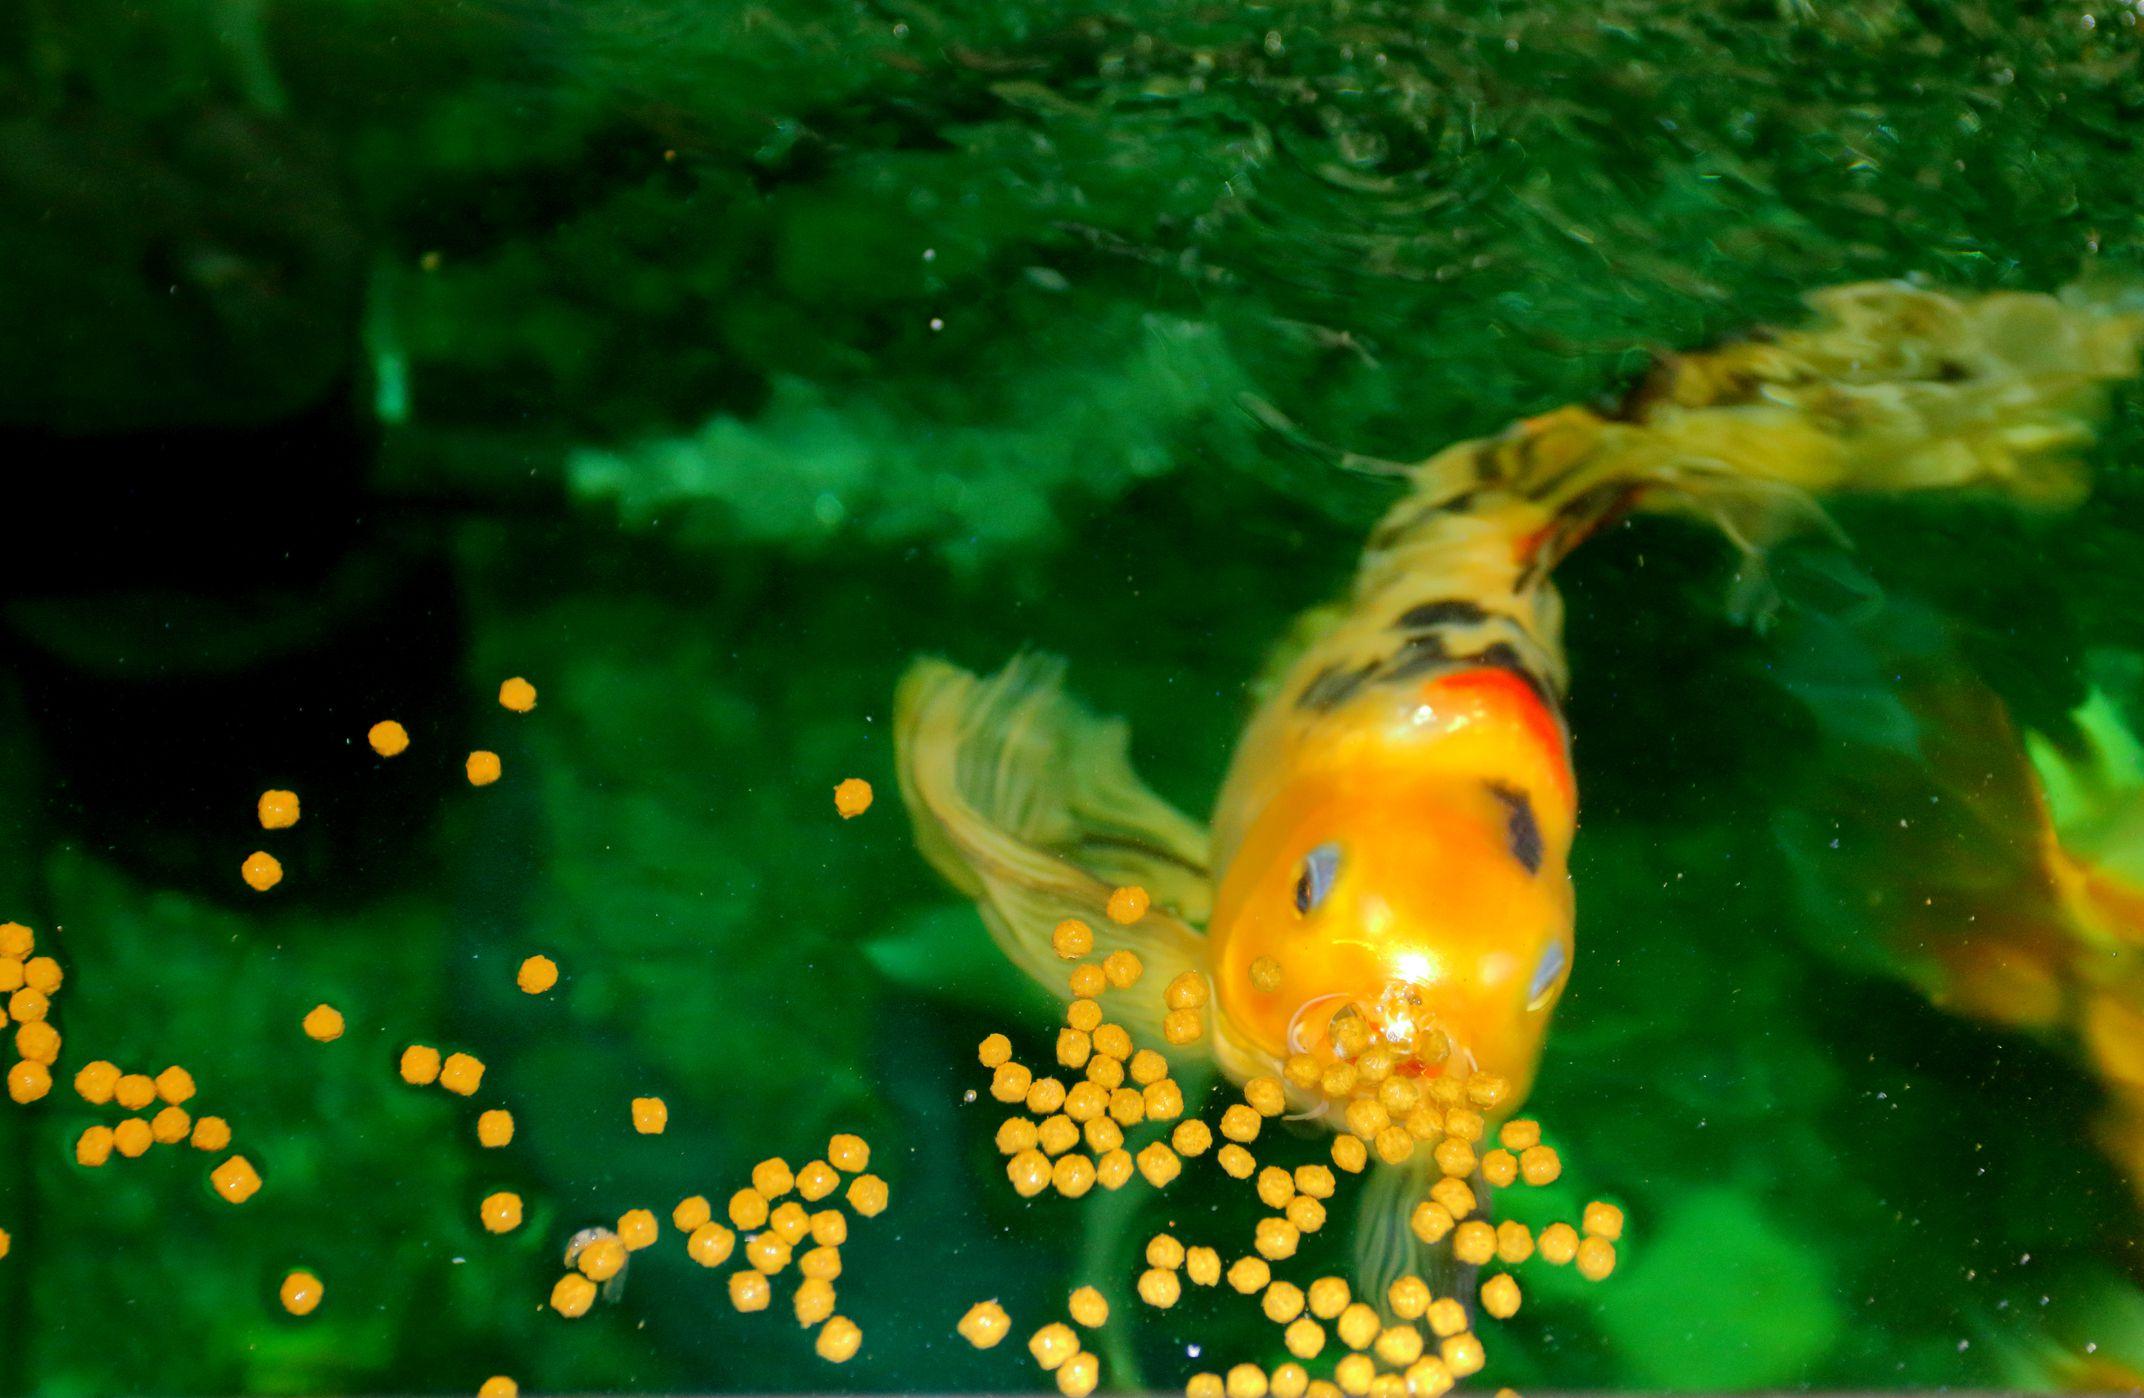 Feeding Your Aquarium Fish The Right Type Of Food